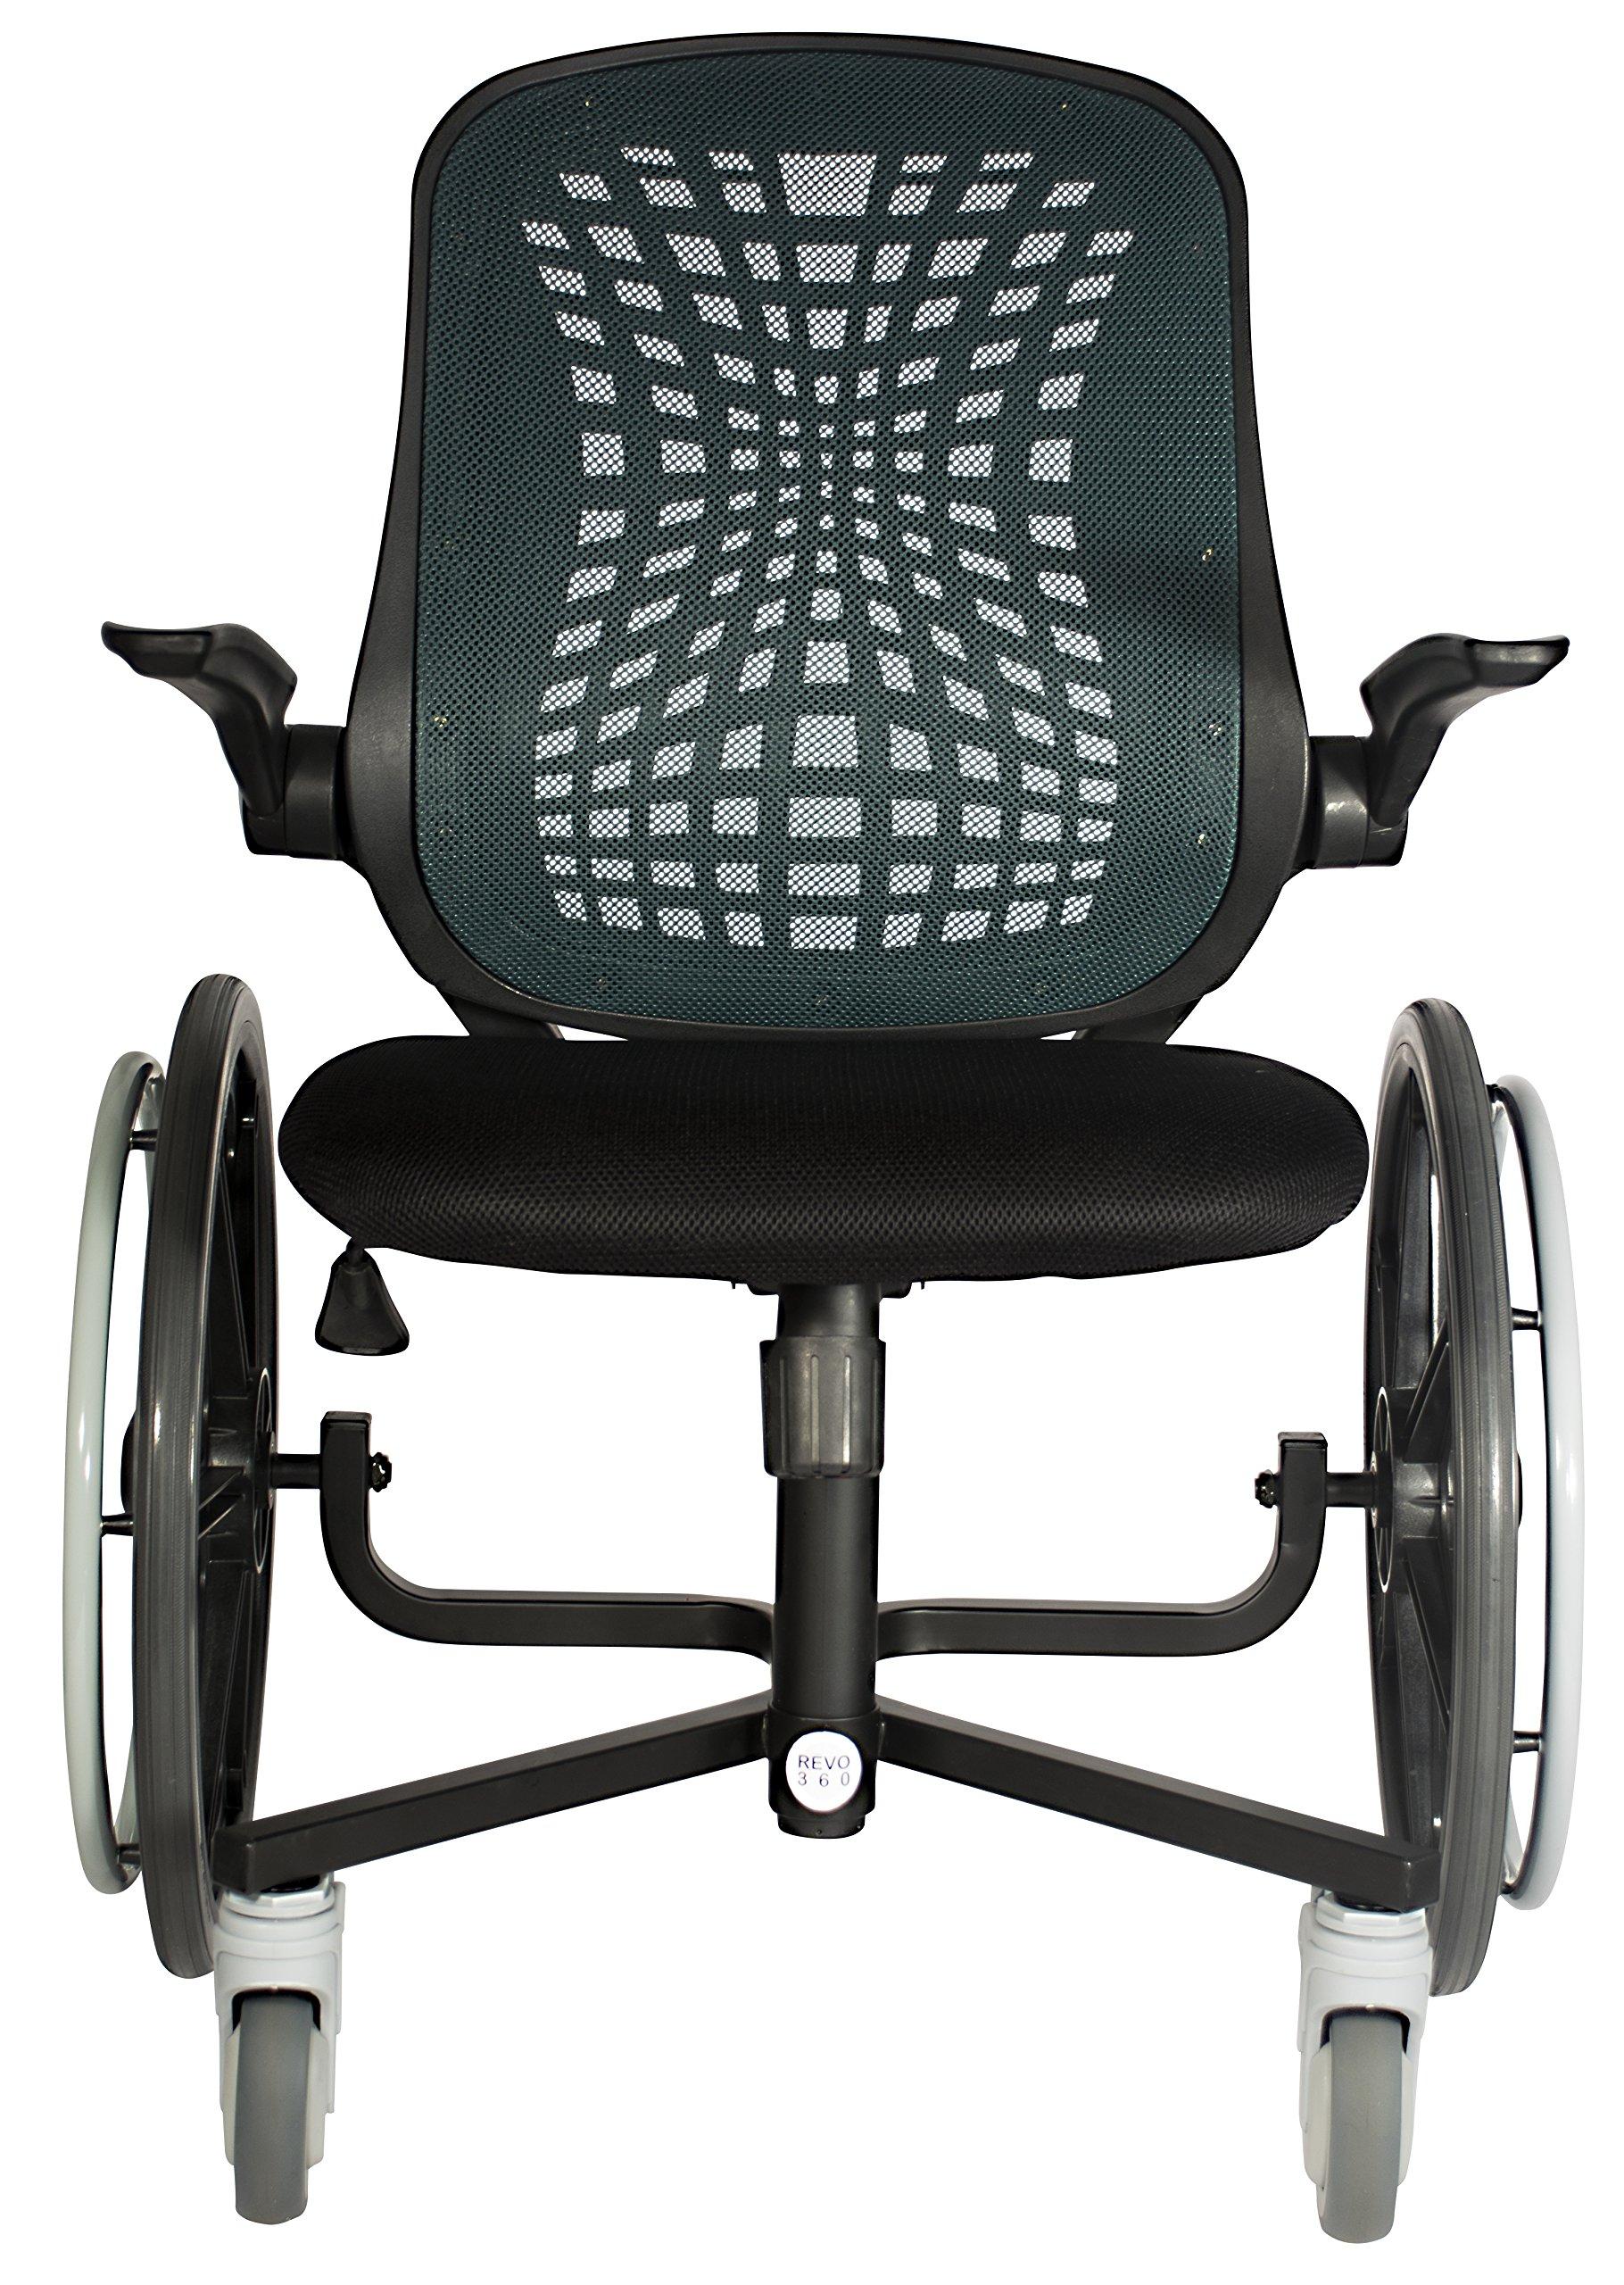 REVO 360 Daily Living Chair (Pine)